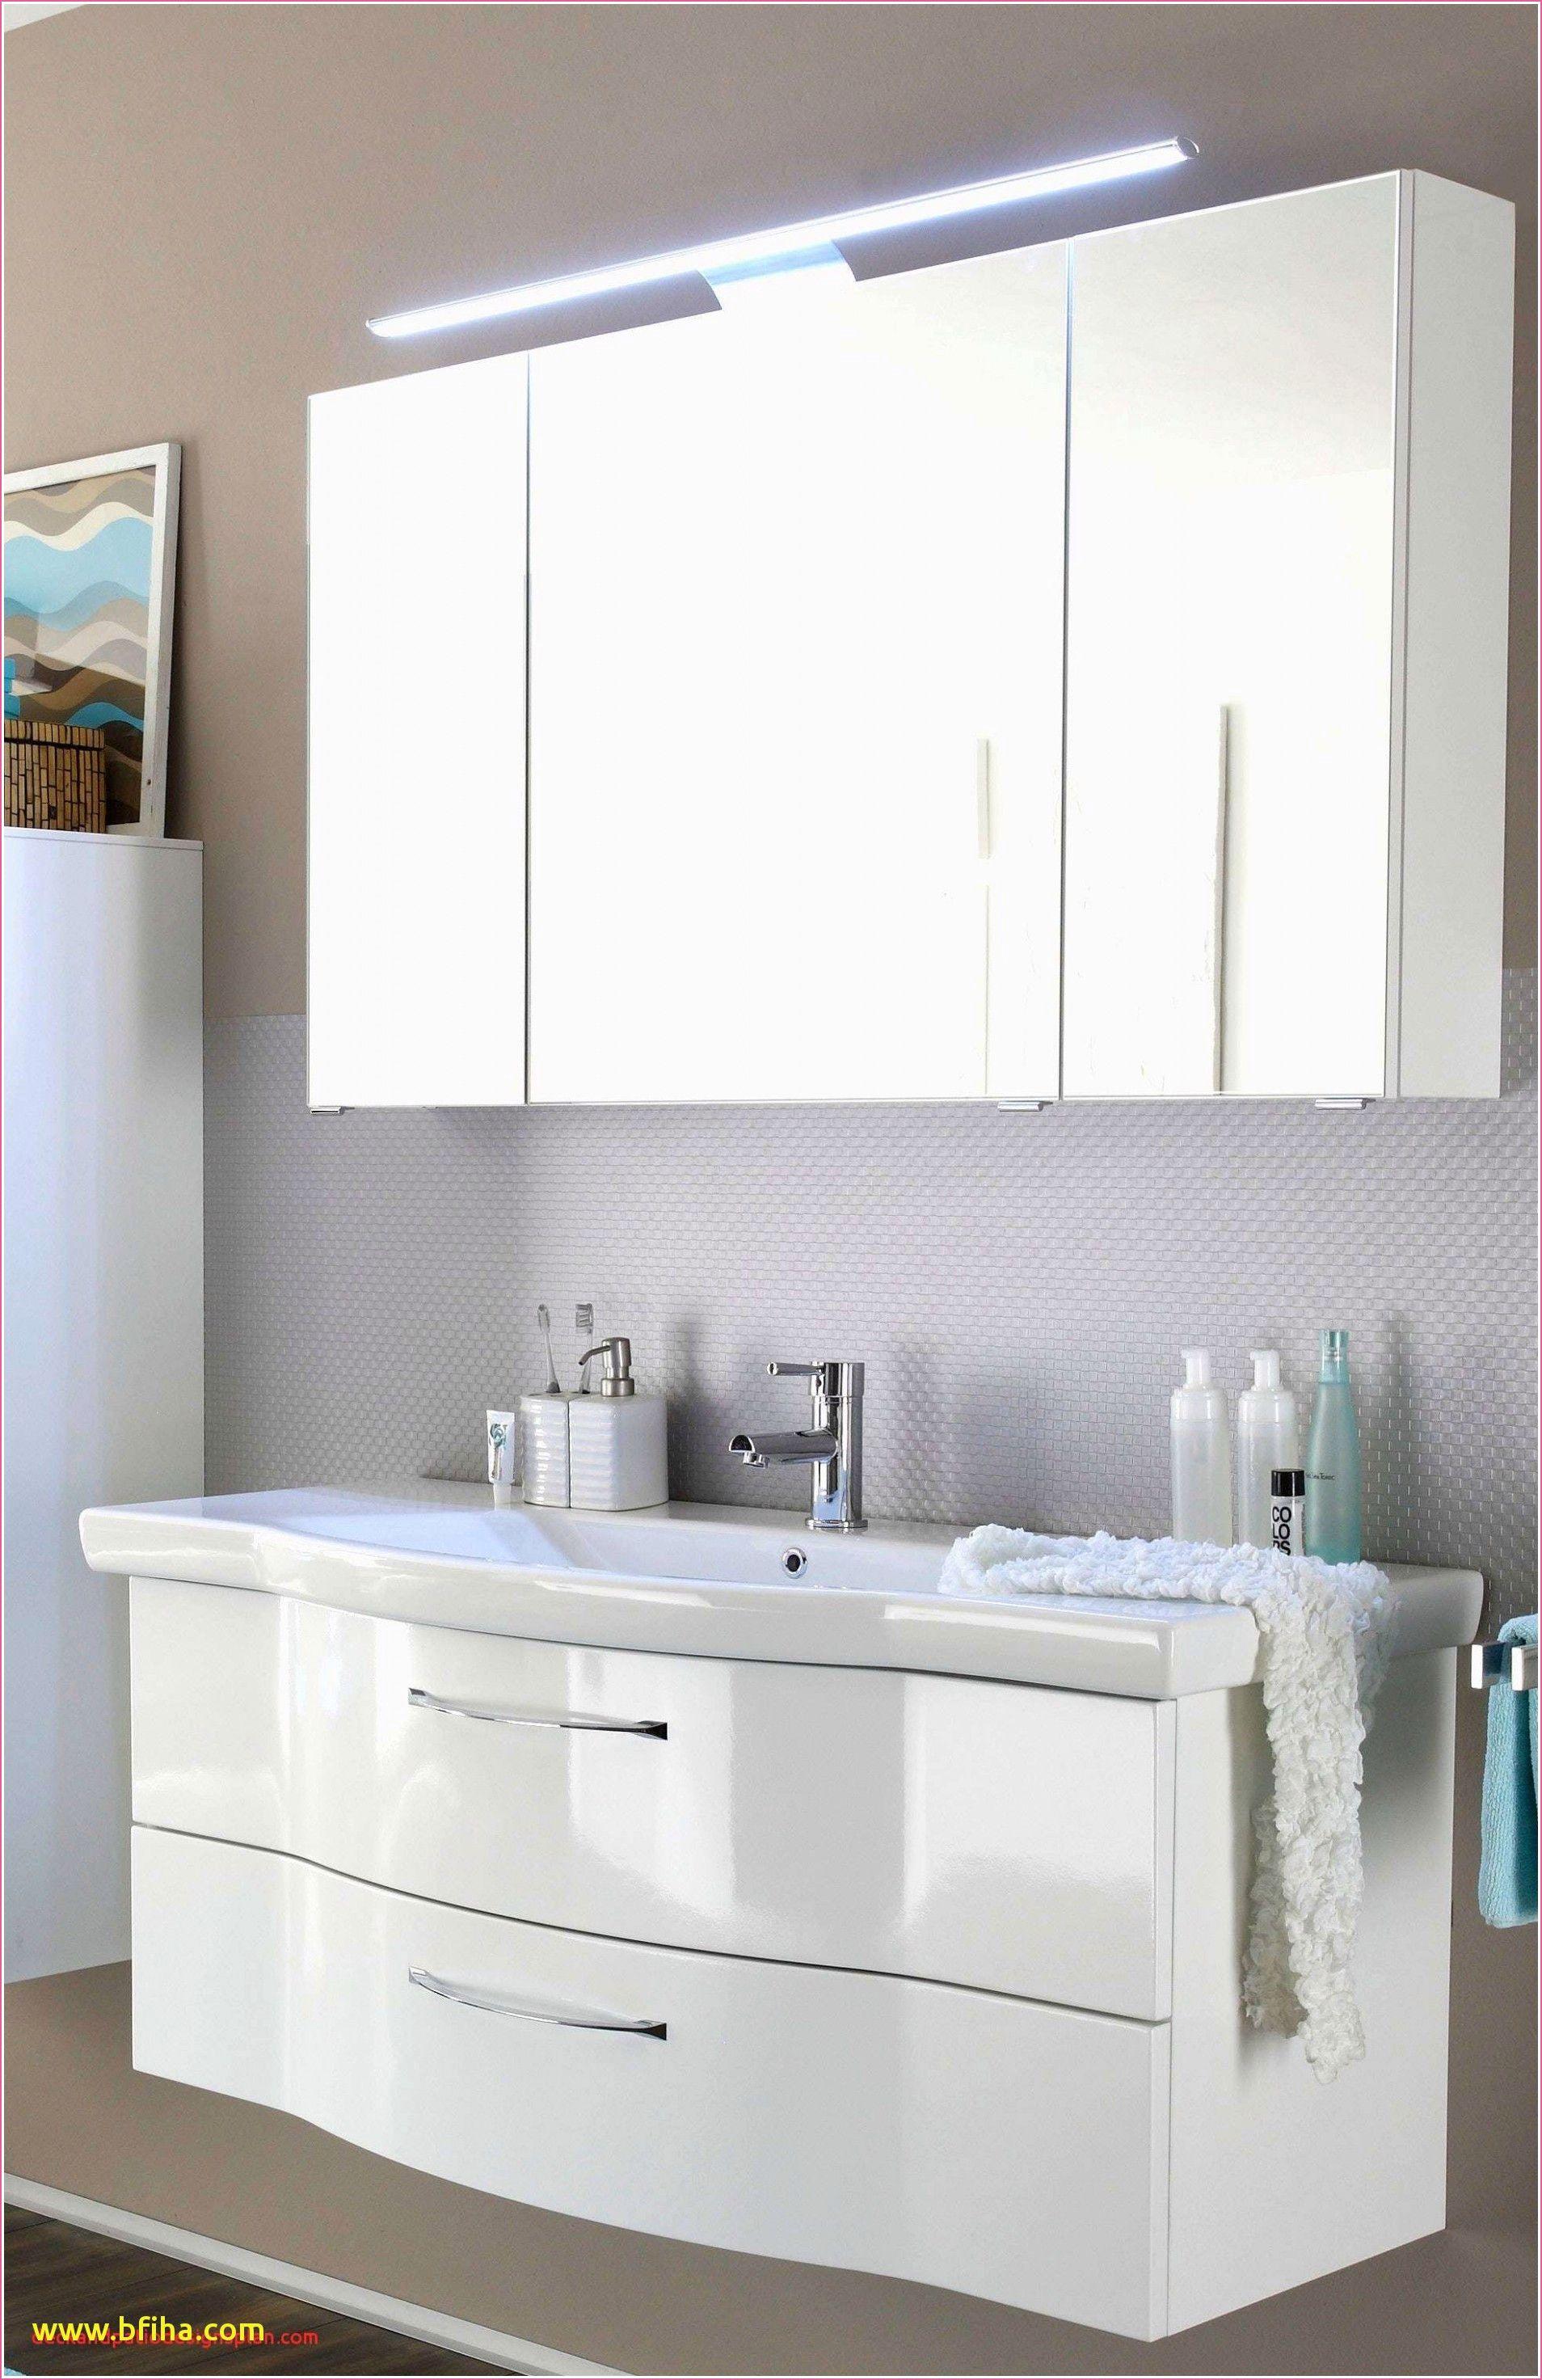 Pin By Ainoo Manoo On Pelipal Bathrooms In 2020 Fine Furniture